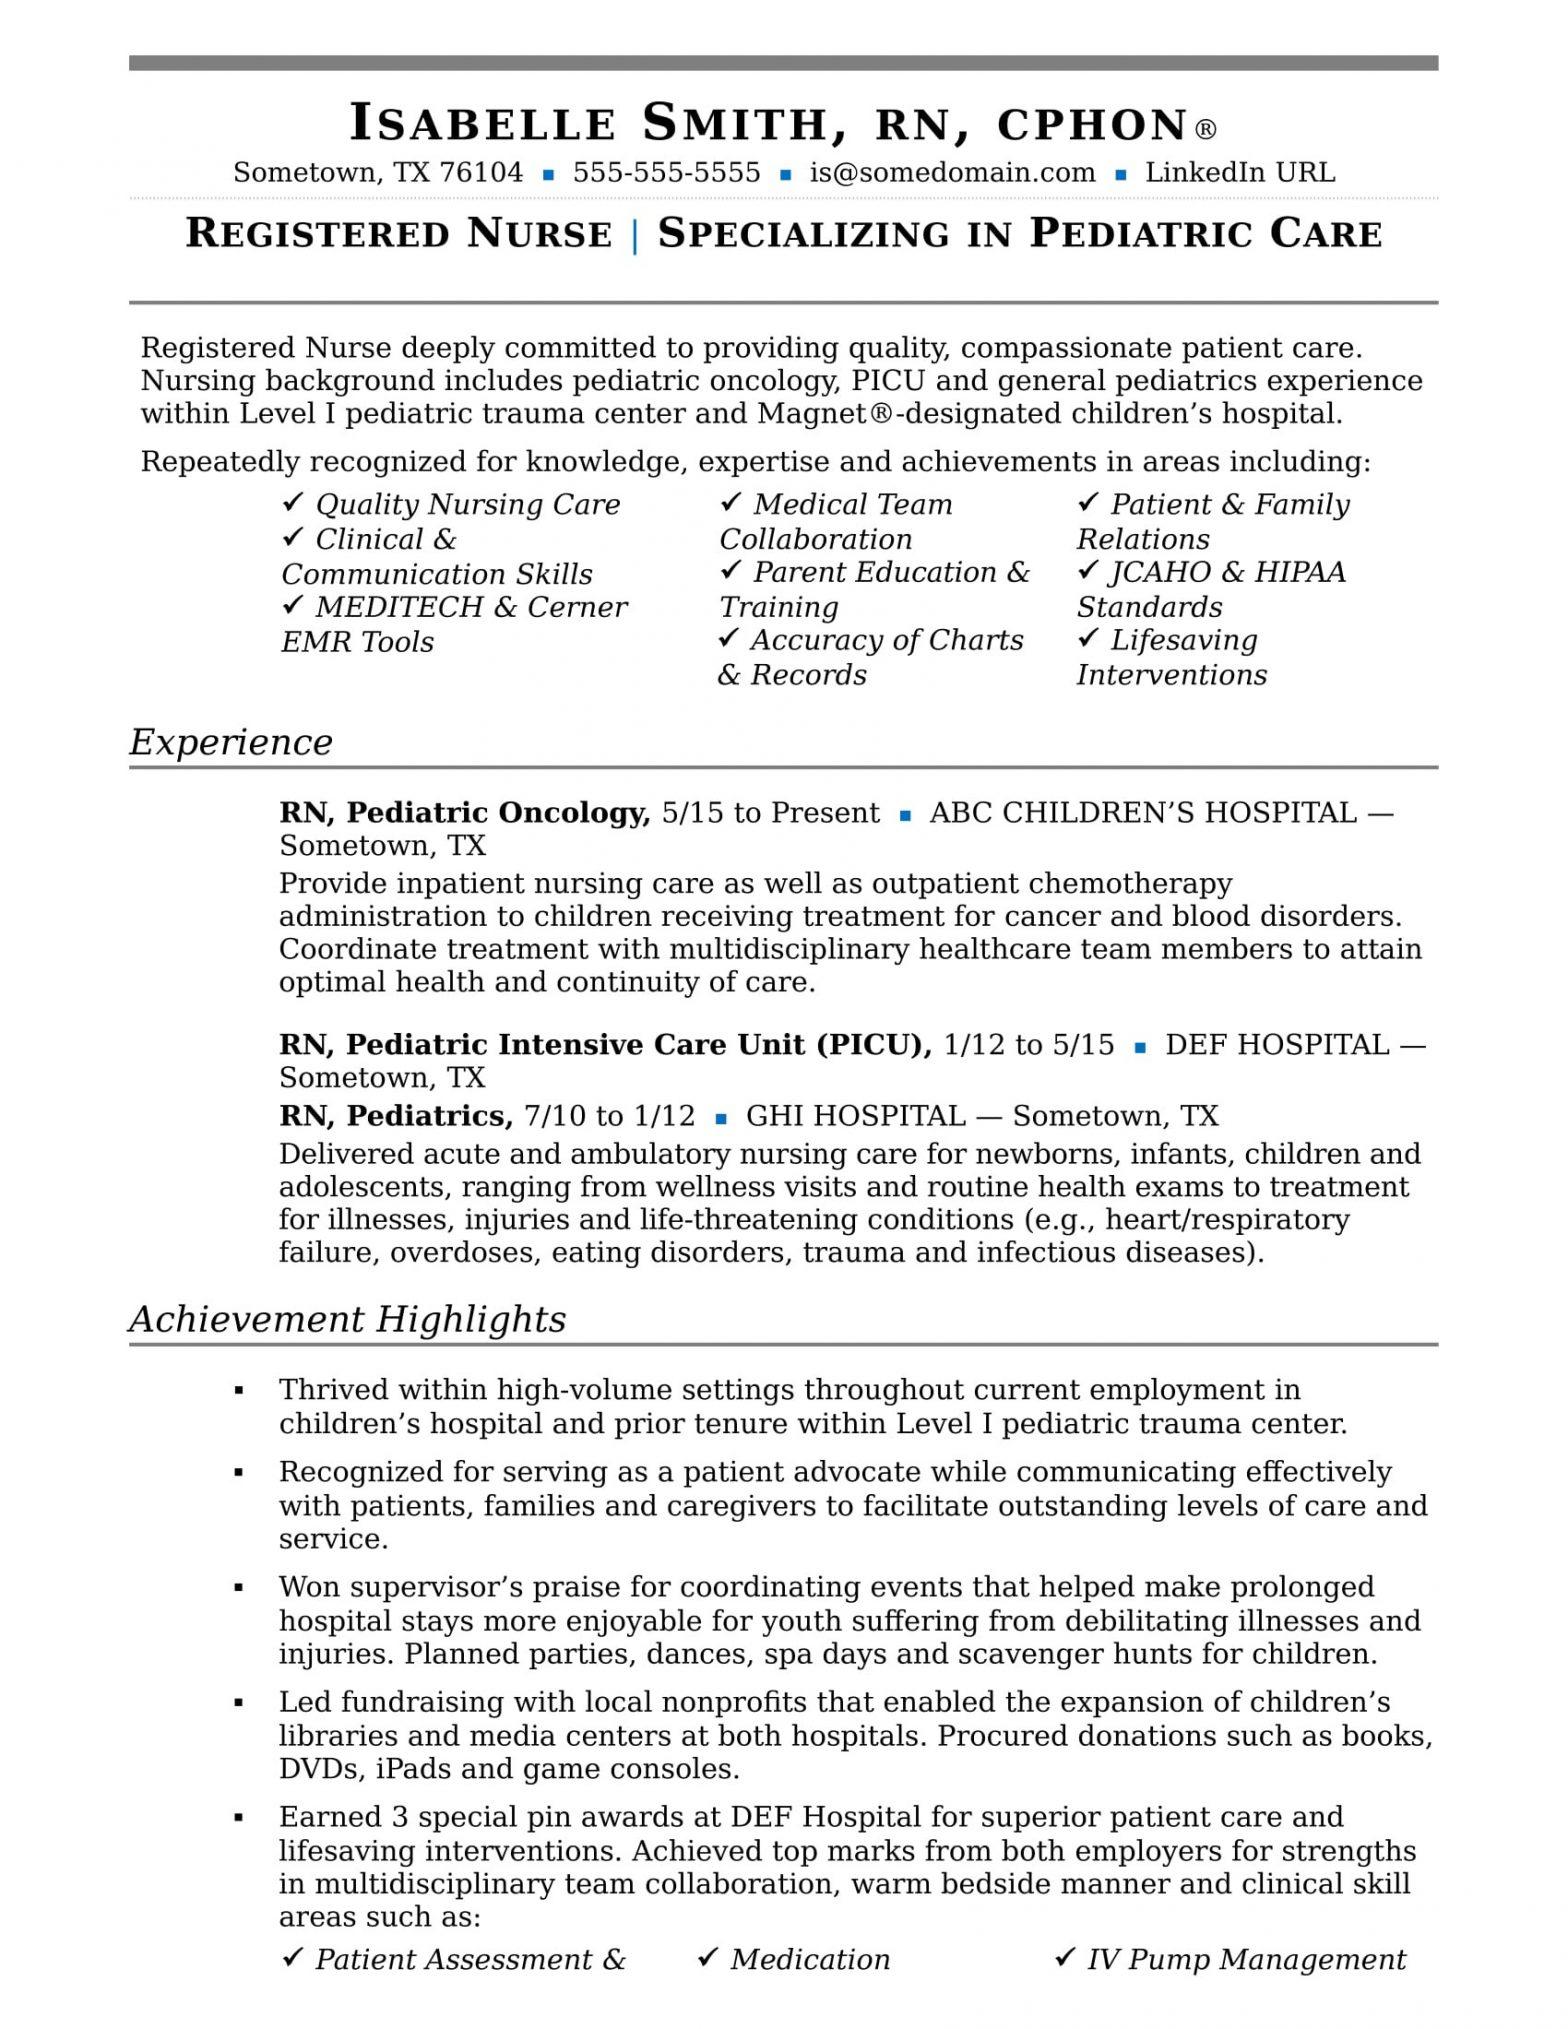 Sample Resume for Registered Nurse with Experience Nurse Resume Sample Monster.com